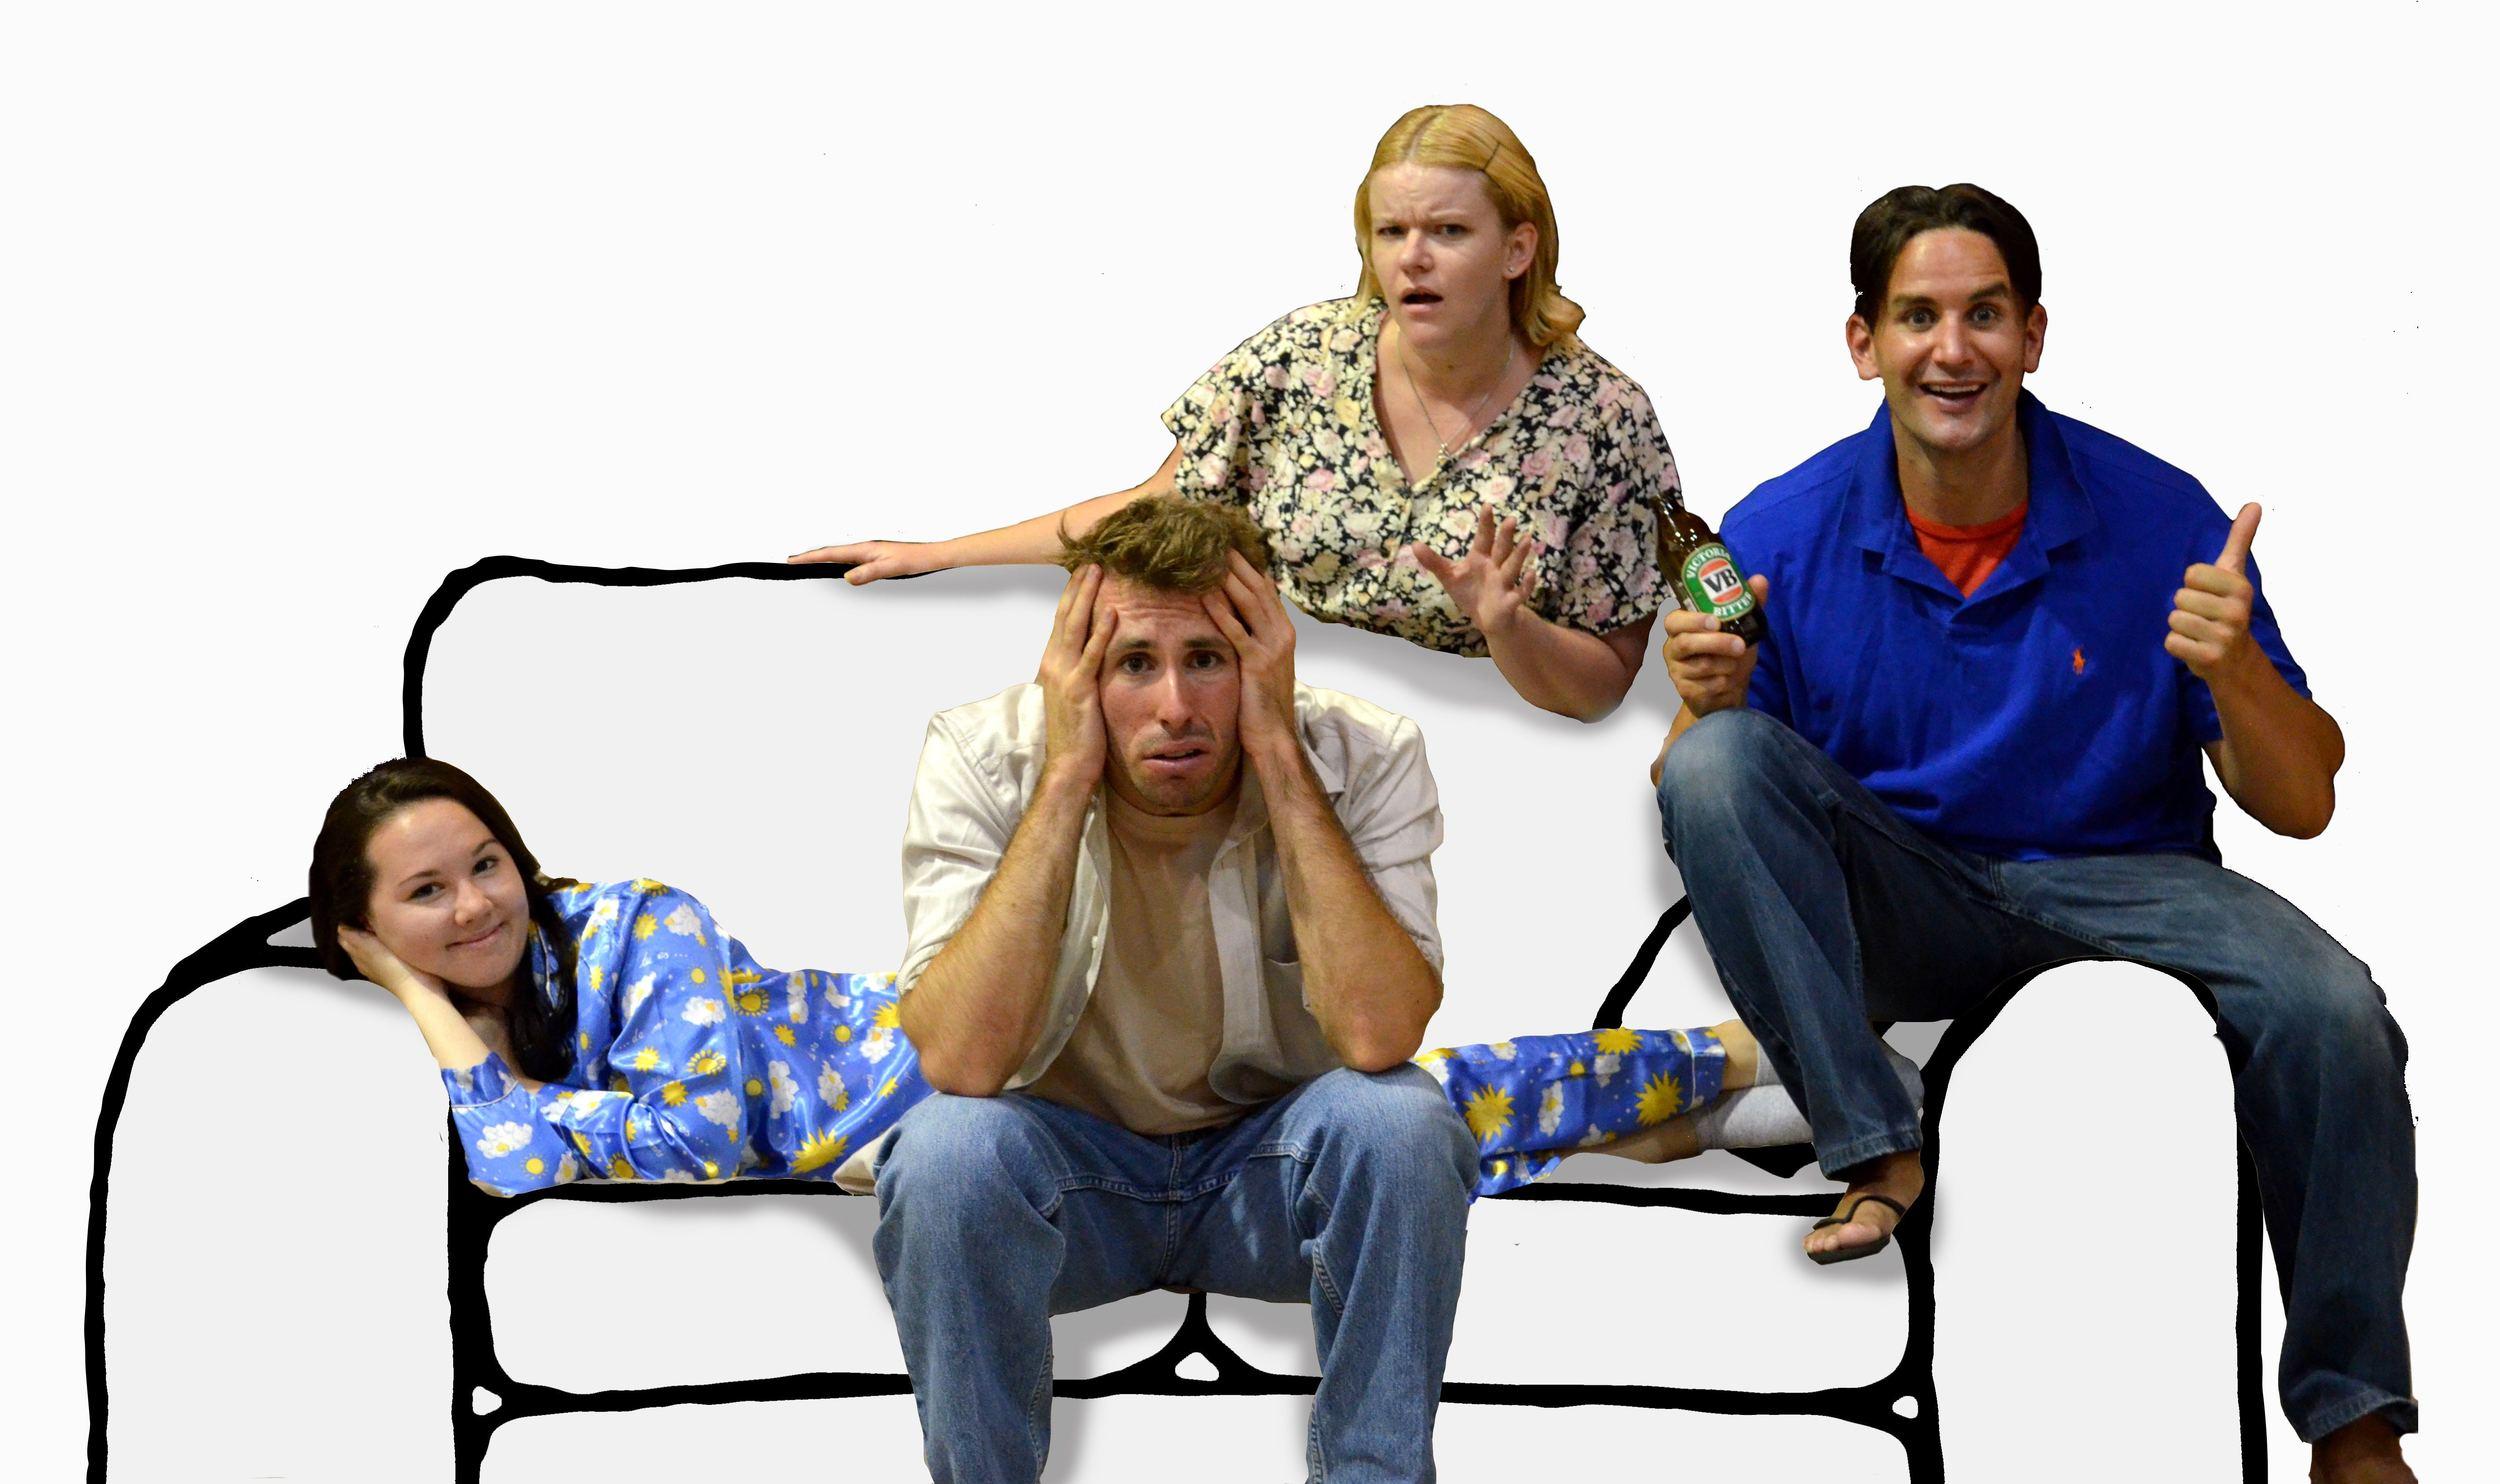 (L-R) Couch Potato cast: Jessica Lawrence, Mark Salvestro, Jennifer Piper, Luke Styles